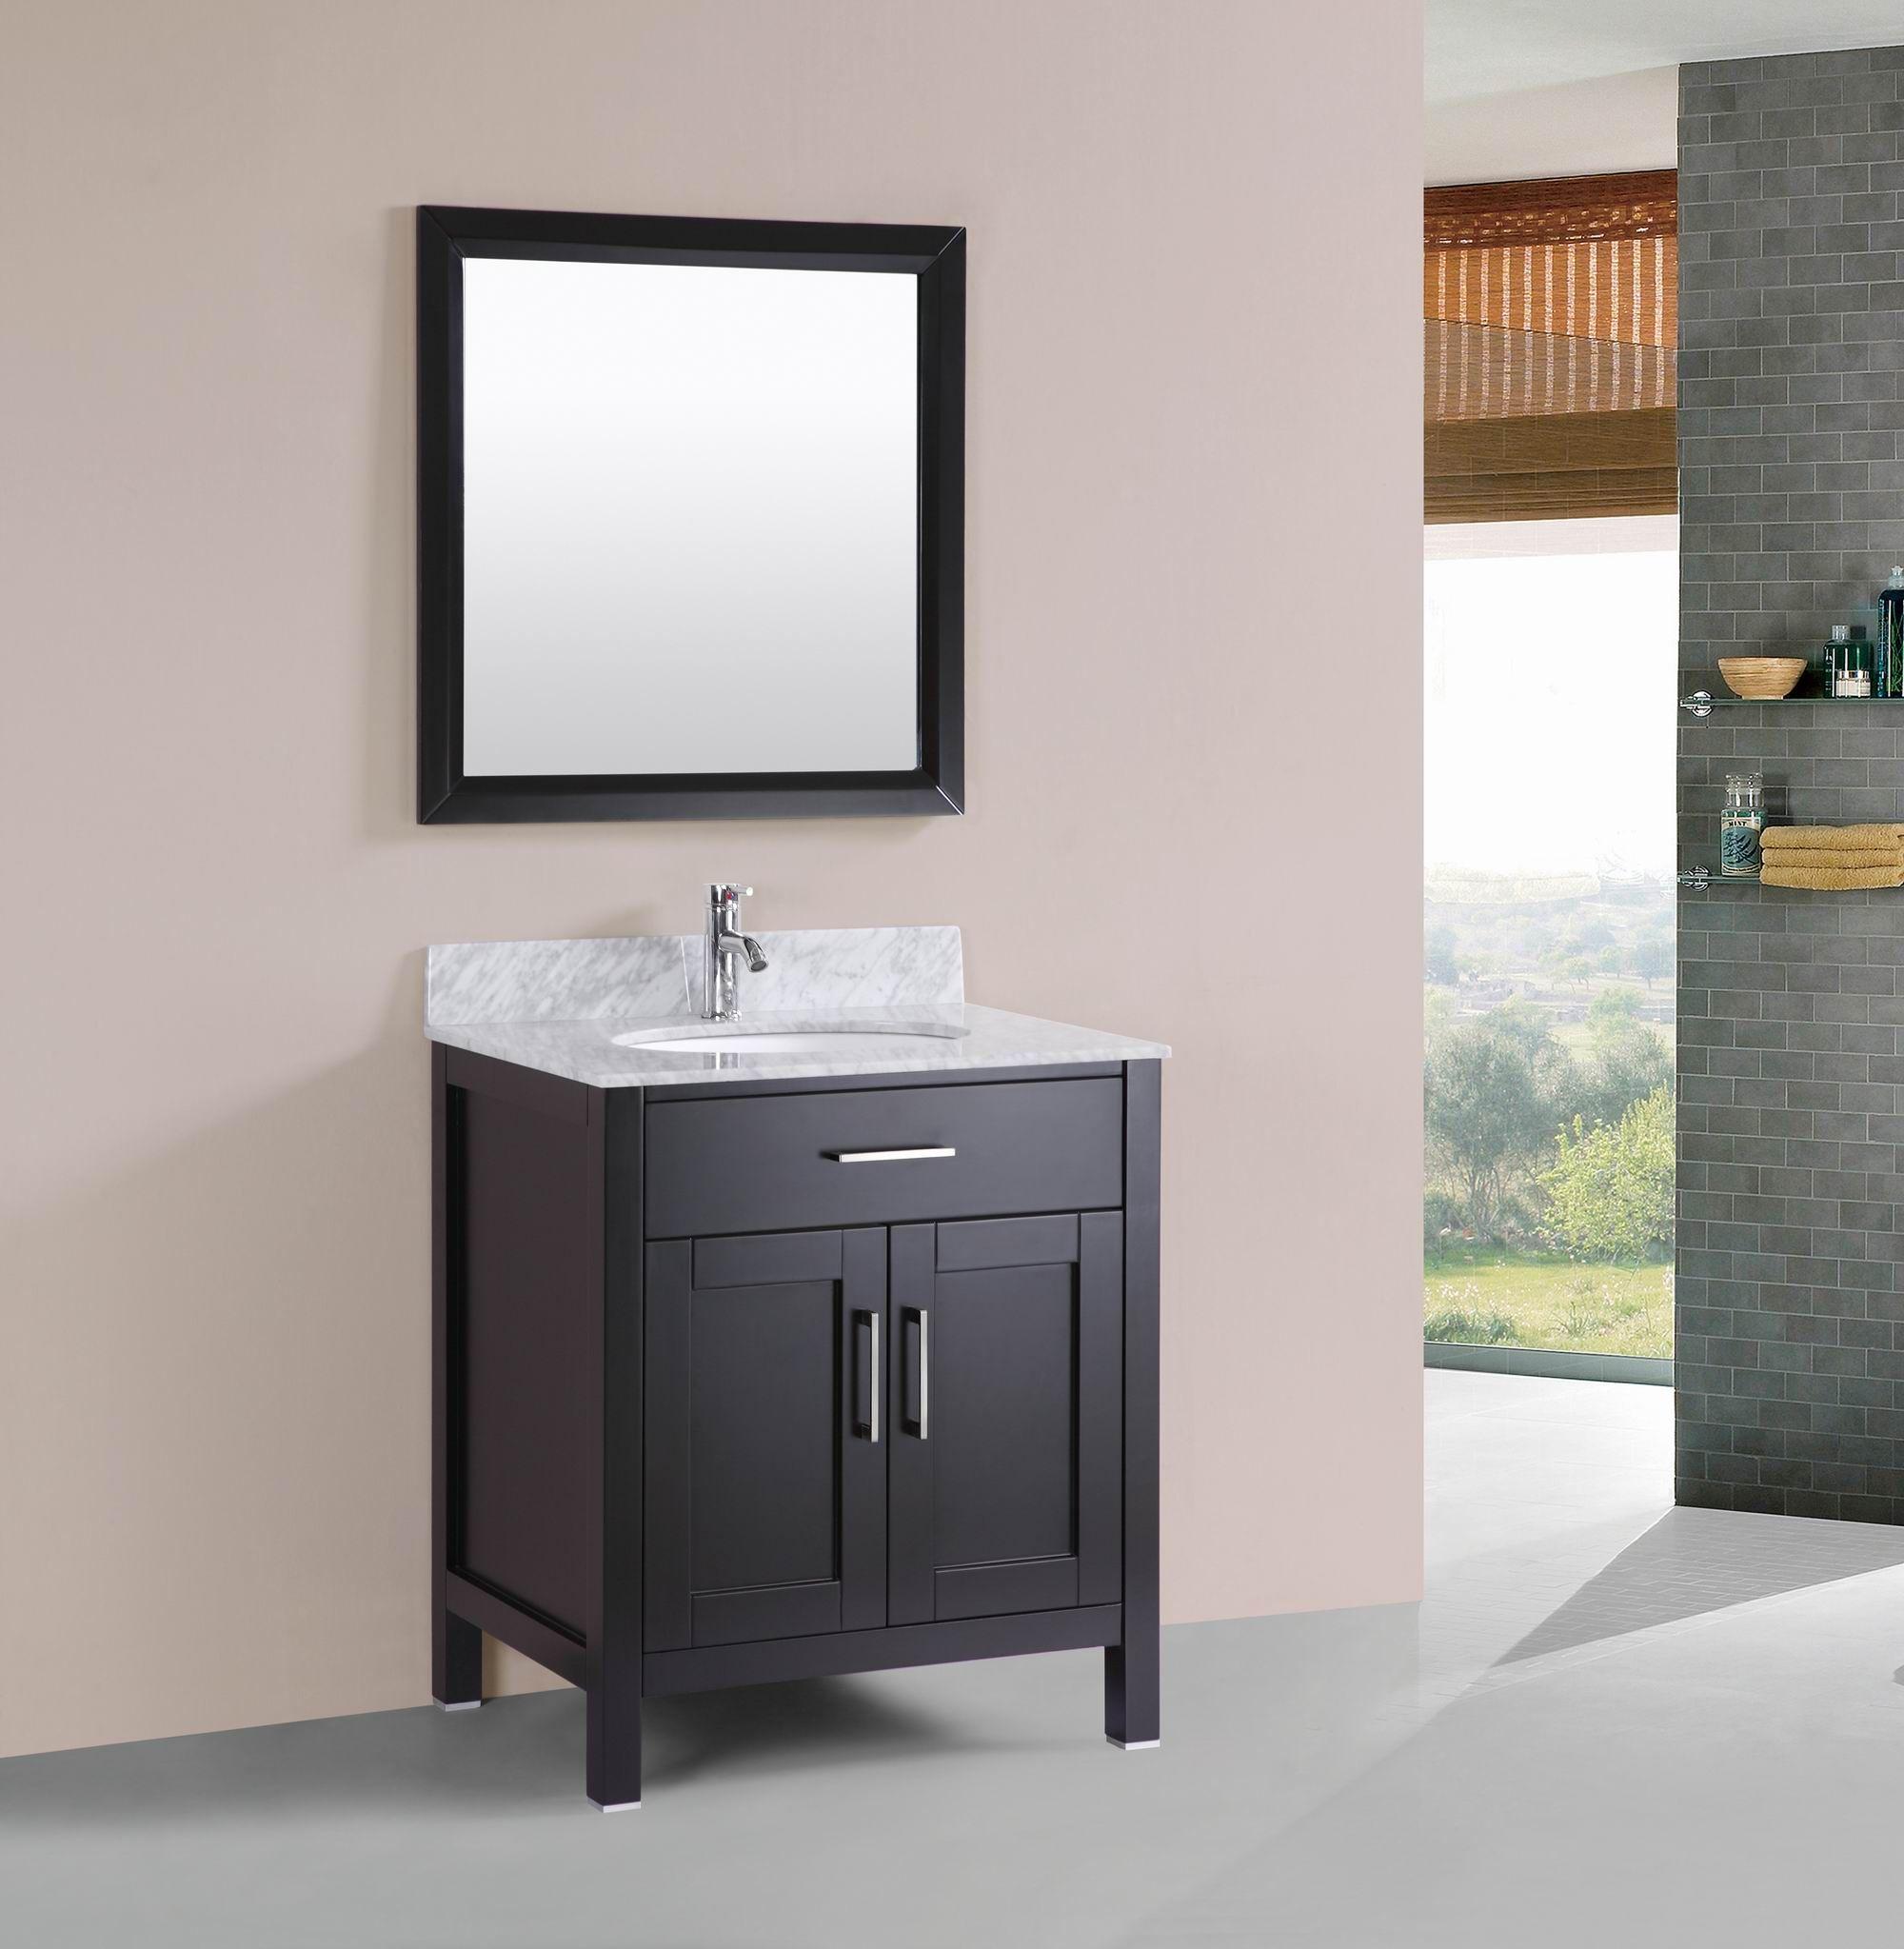 30 Inch Belvedere Freestanding Modern Espresso Brown Bathroom Inspiration Bathroom Vanity 30 Inch Inspiration